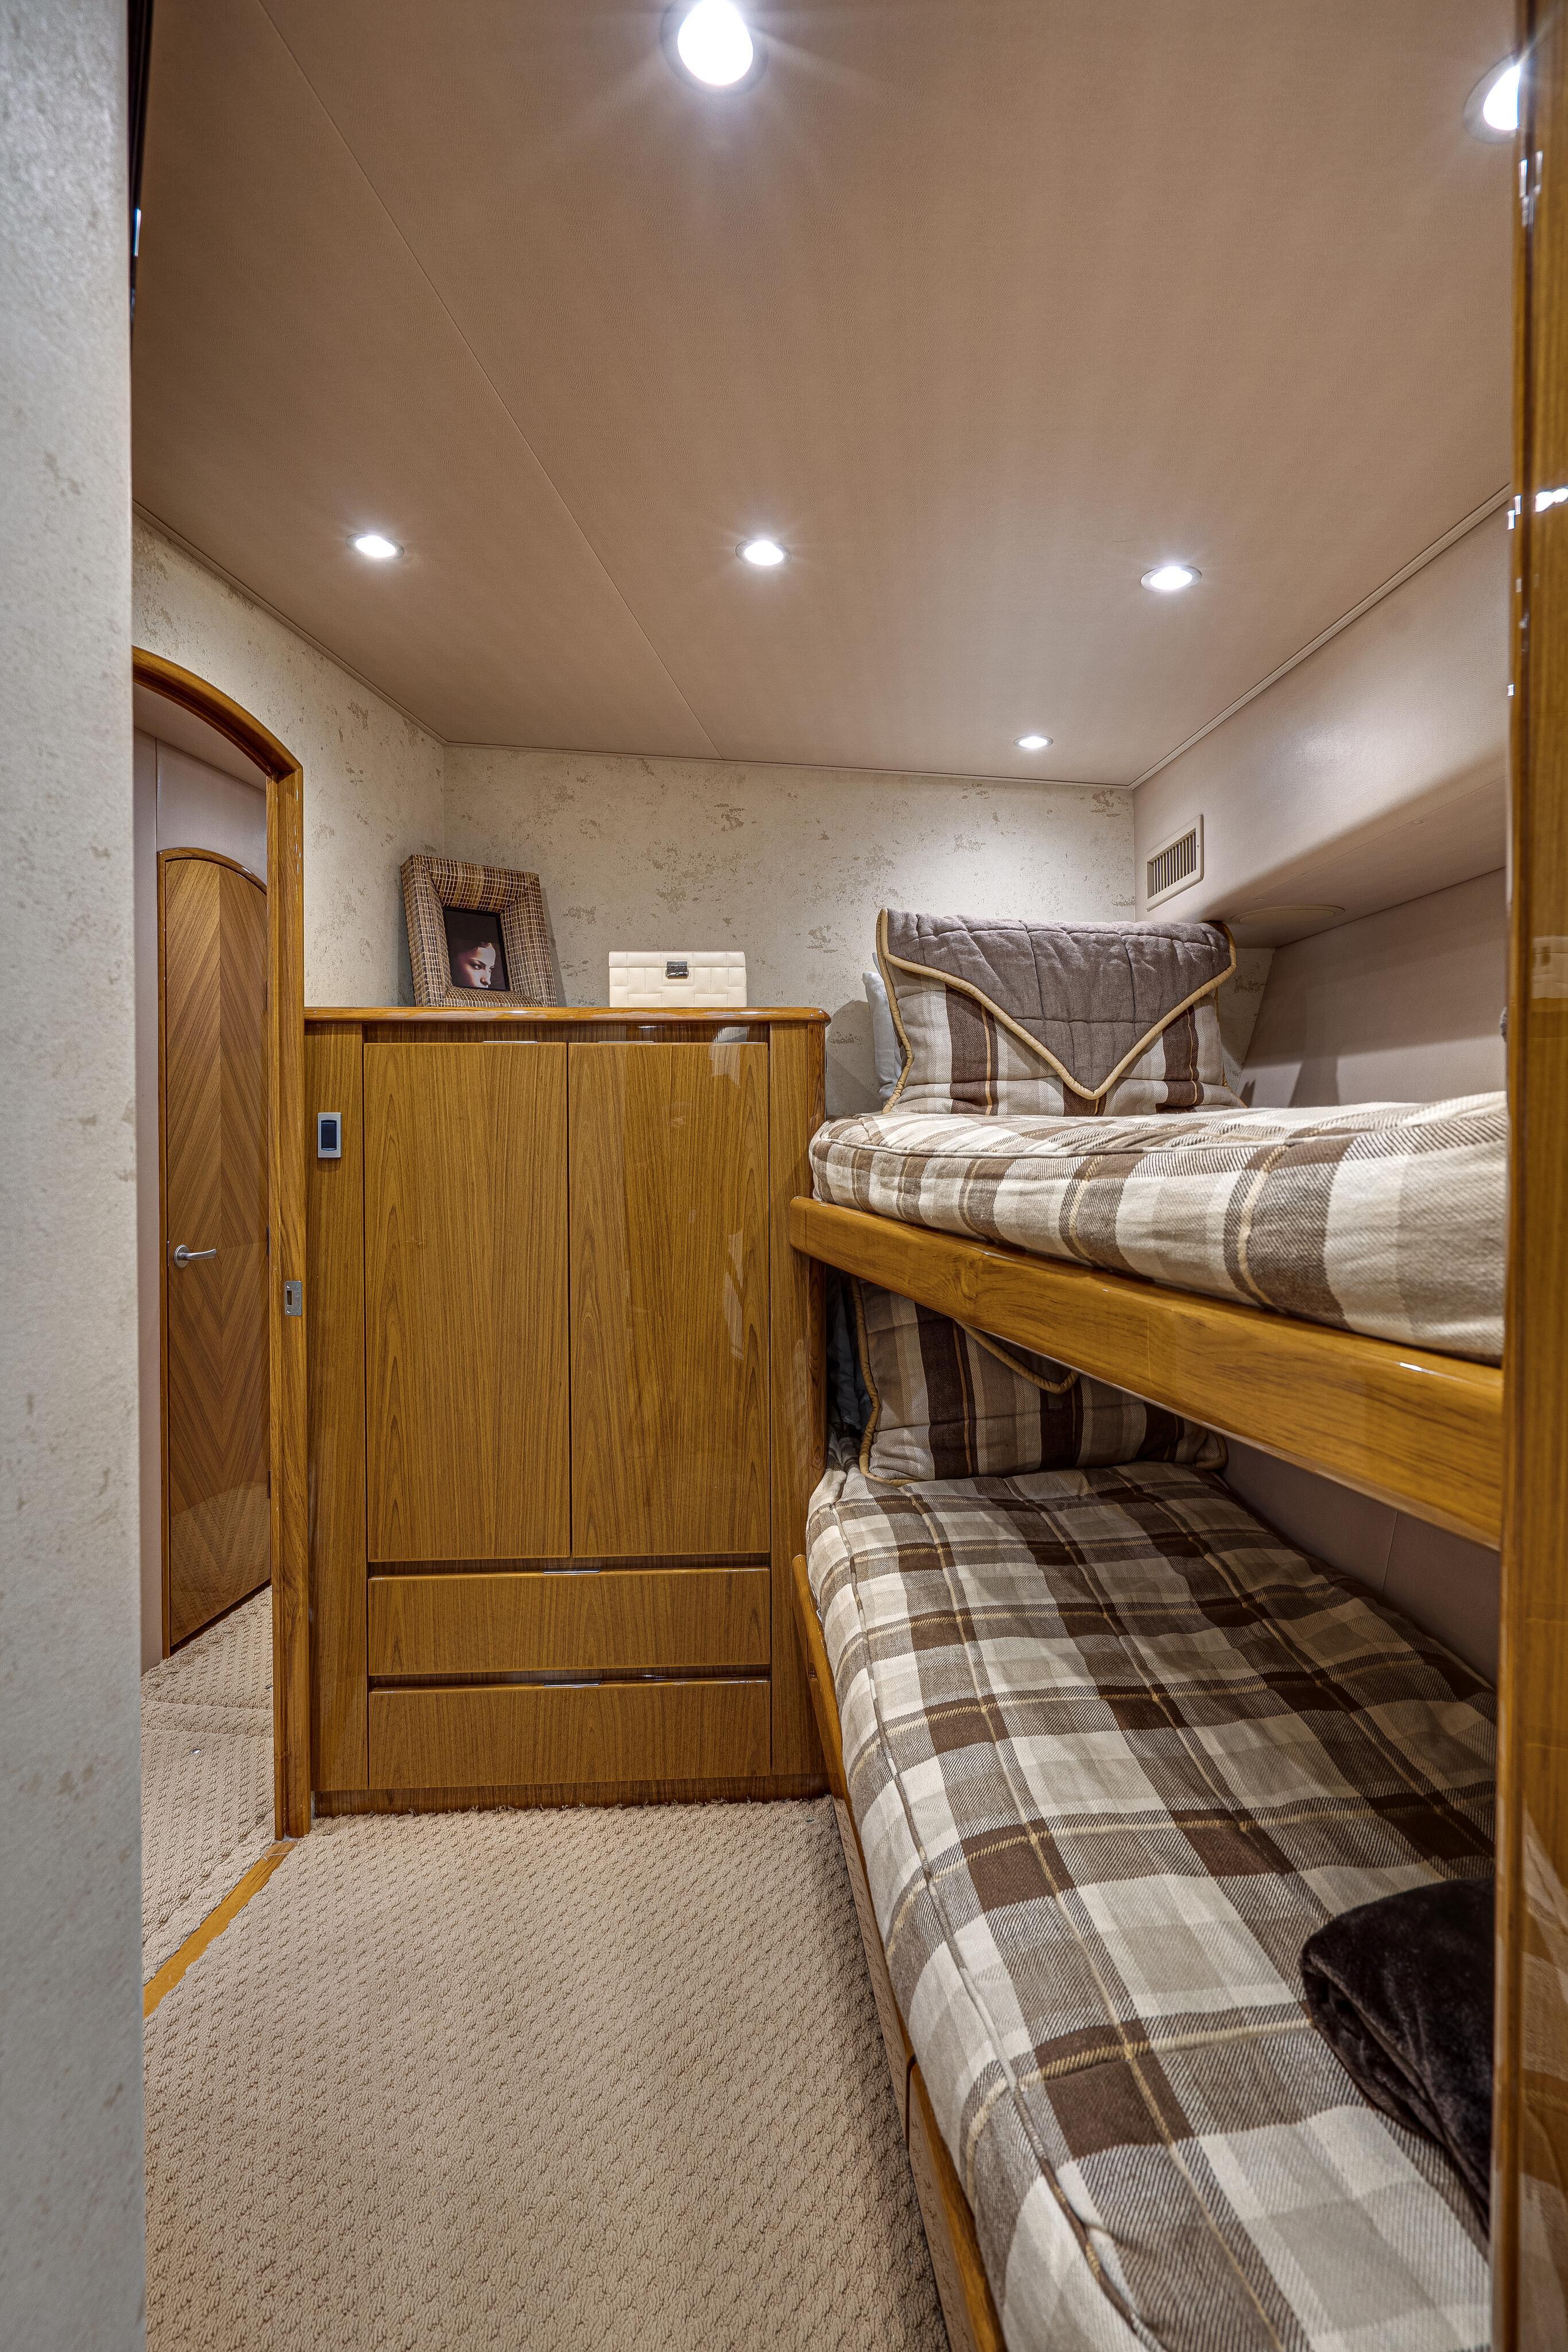 2012 76 Viking SF - Bunk Room